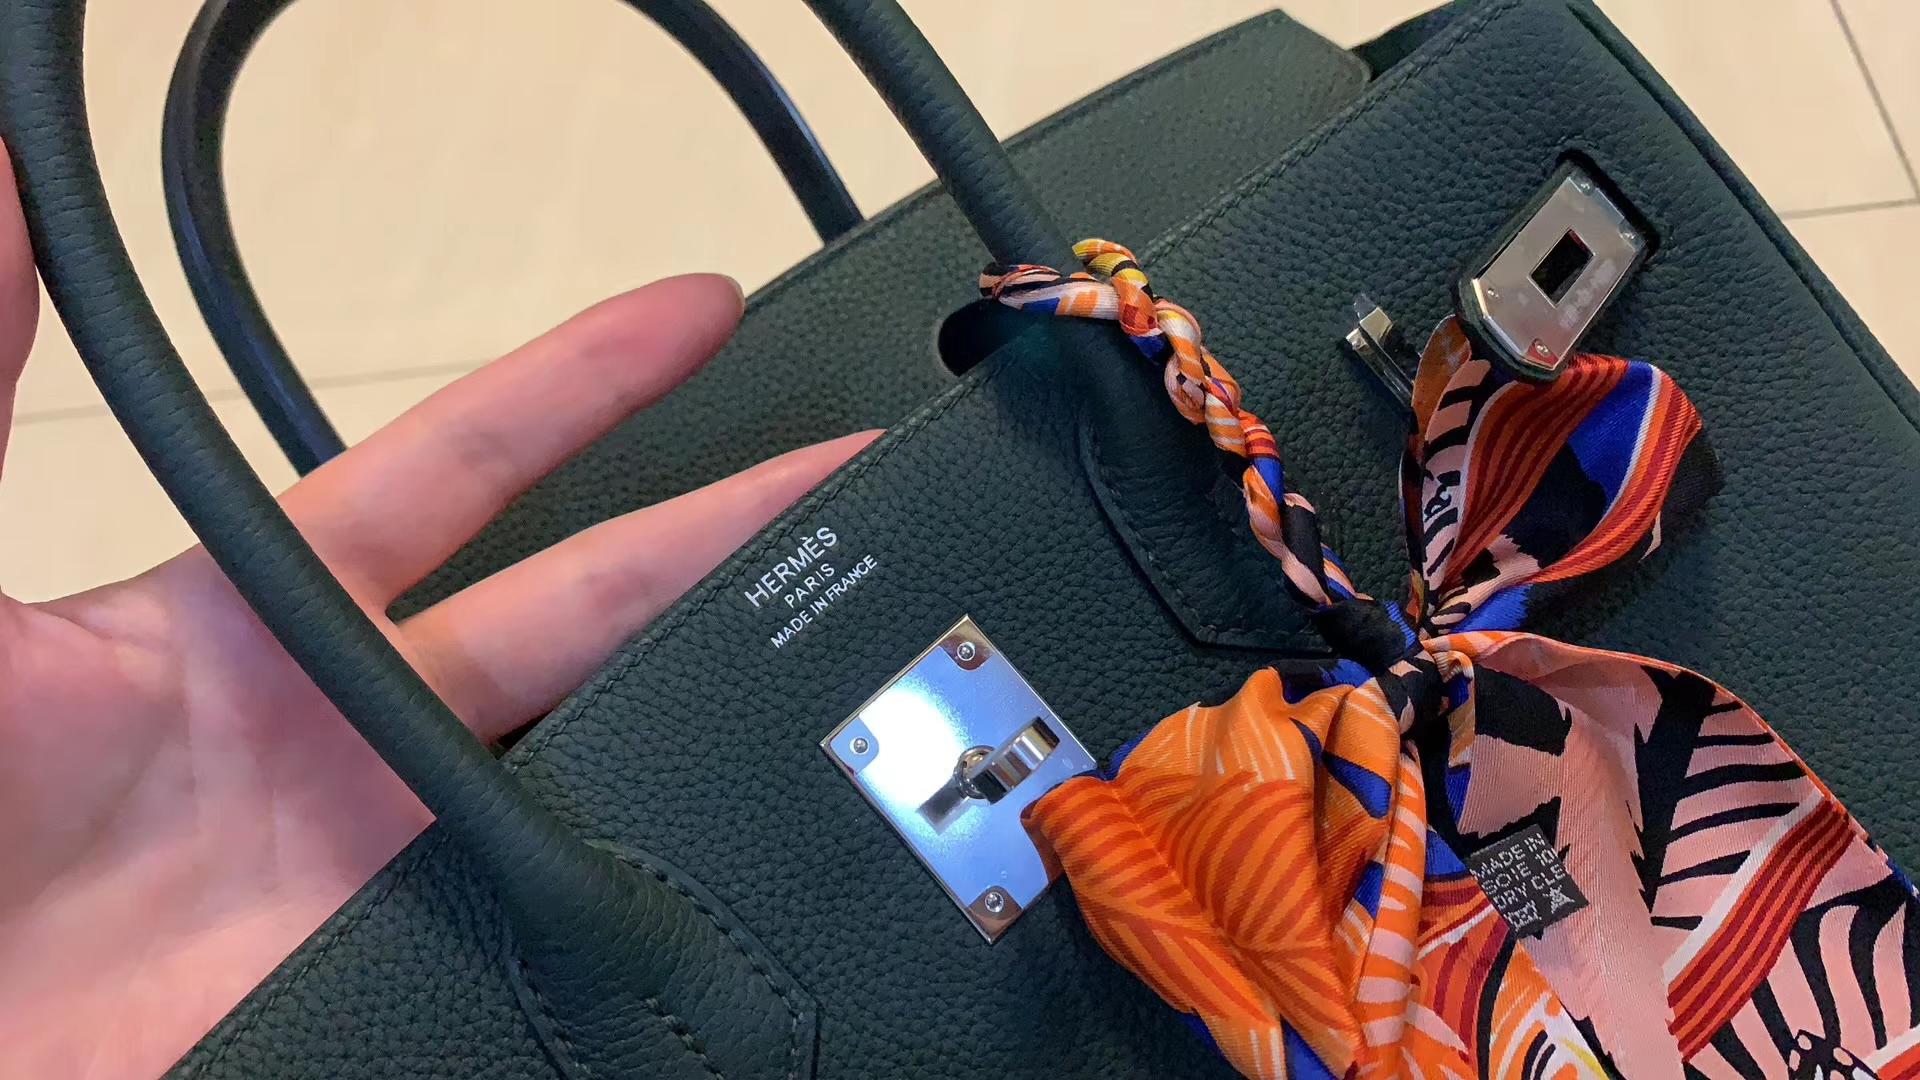 Hermès(爱马仕)Birkin 铂金包 烫金师傅的手艺 杠杠的